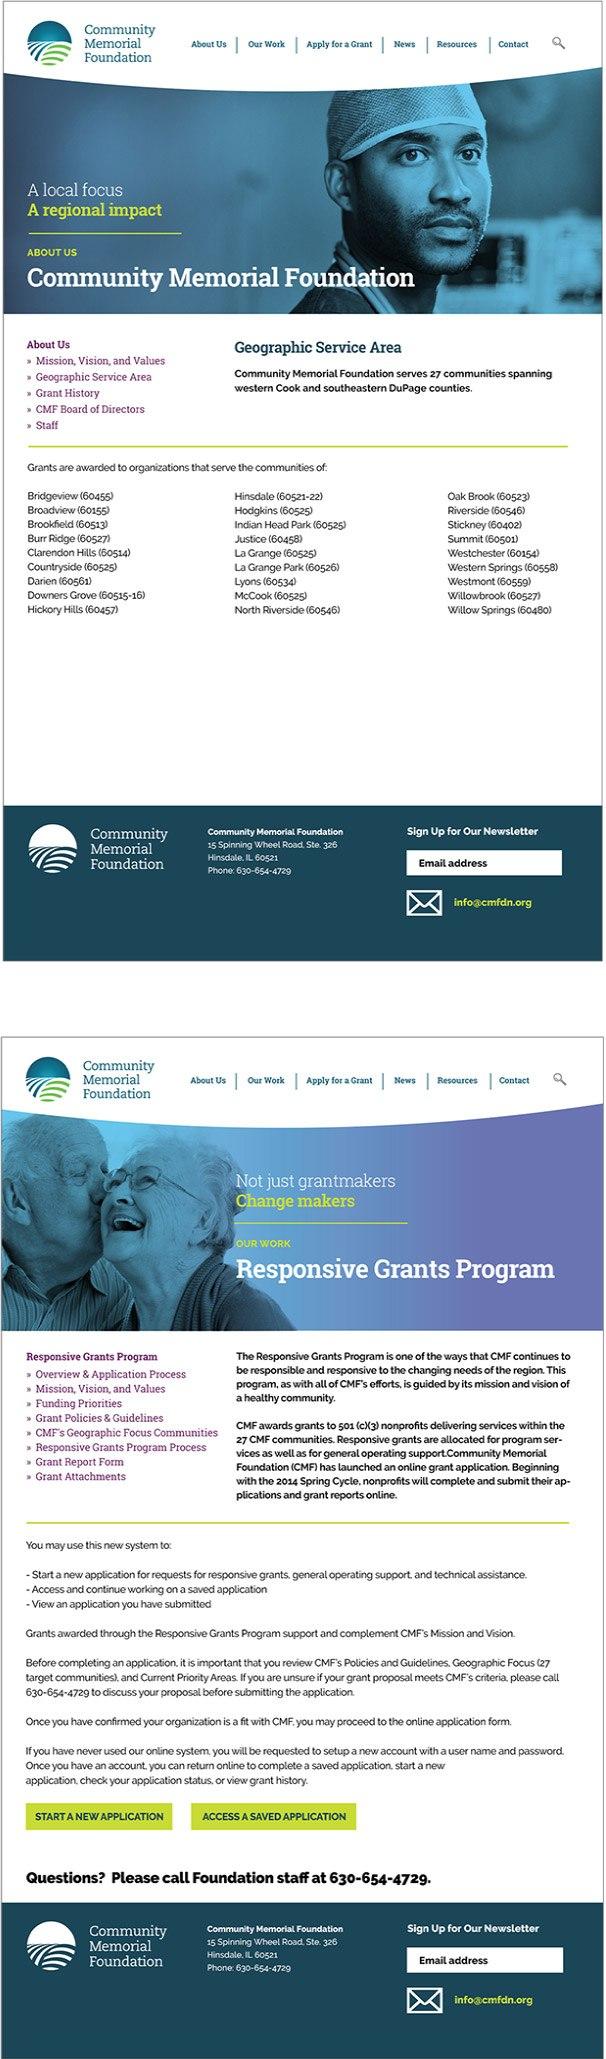 Community Memorial Foundation website 2